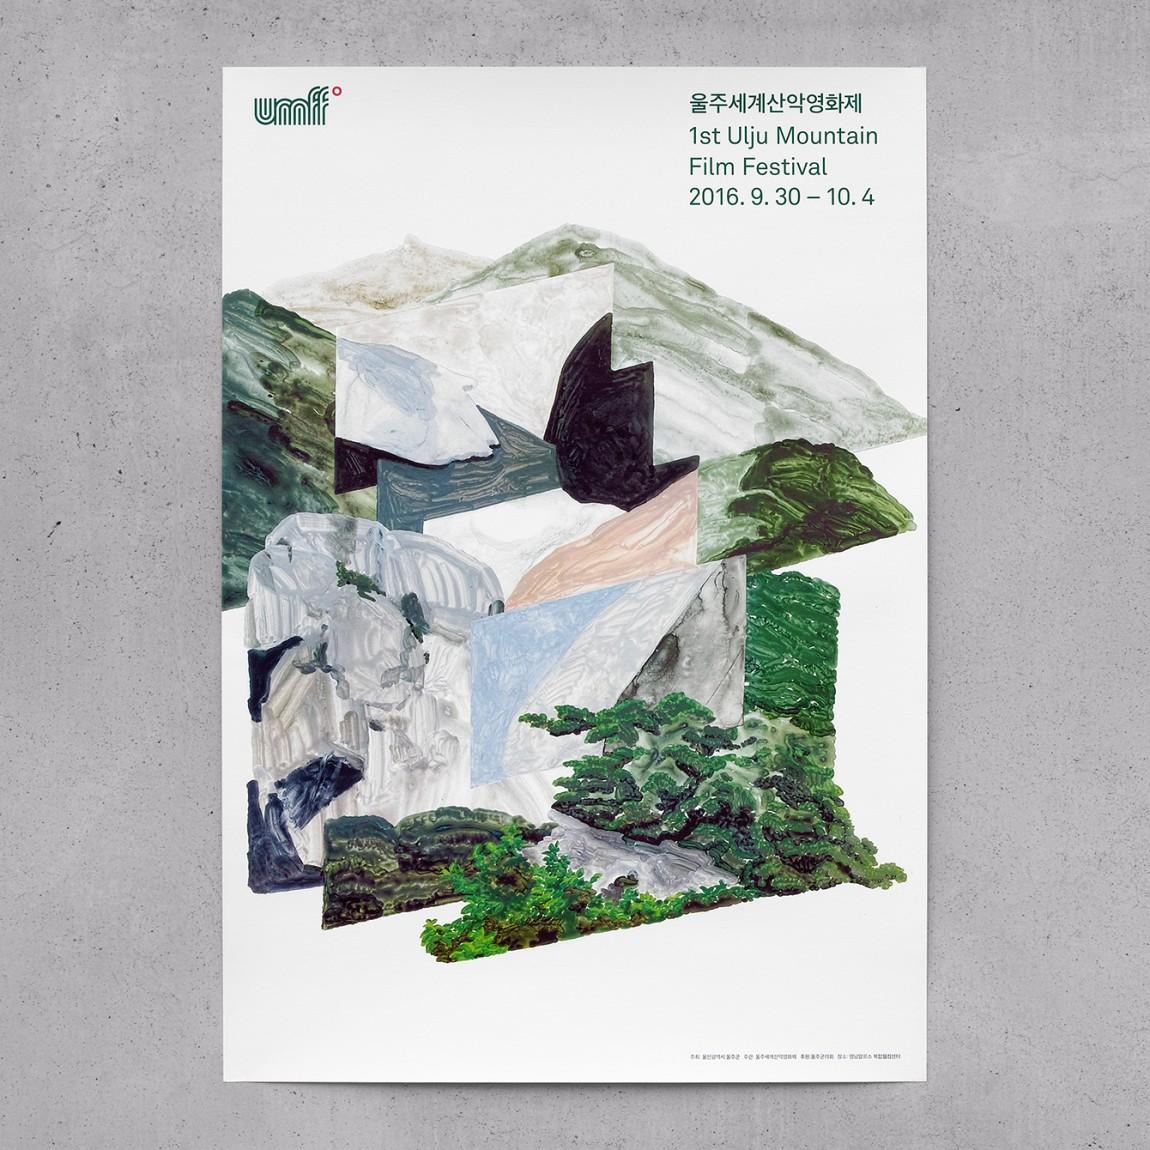 Ulju Mountain Film Festival posters designed by Studio fnt